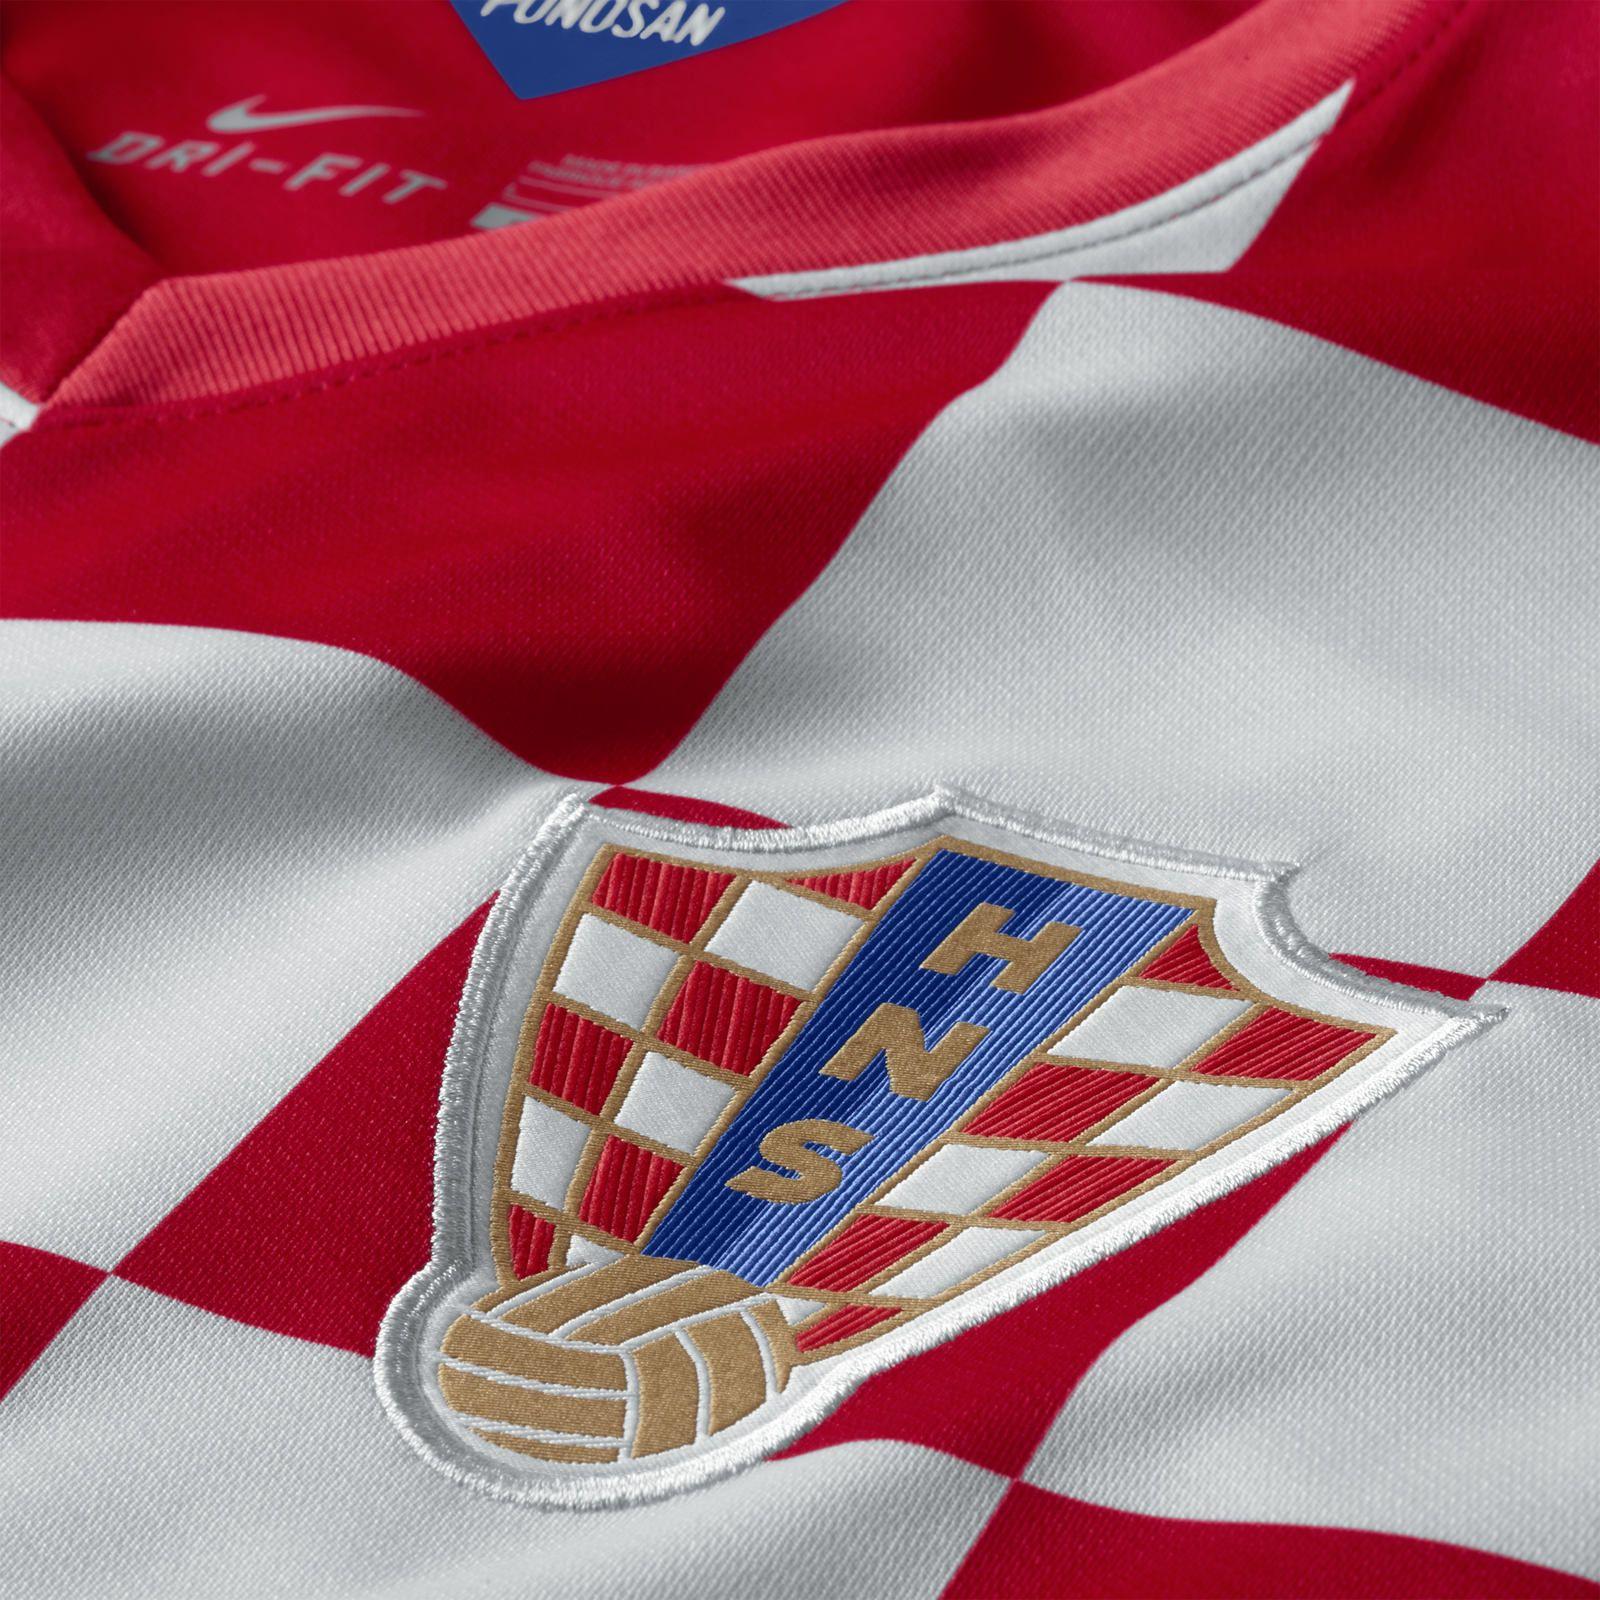 Croatia 2014 World Cup Kit World cup kits, Croatia